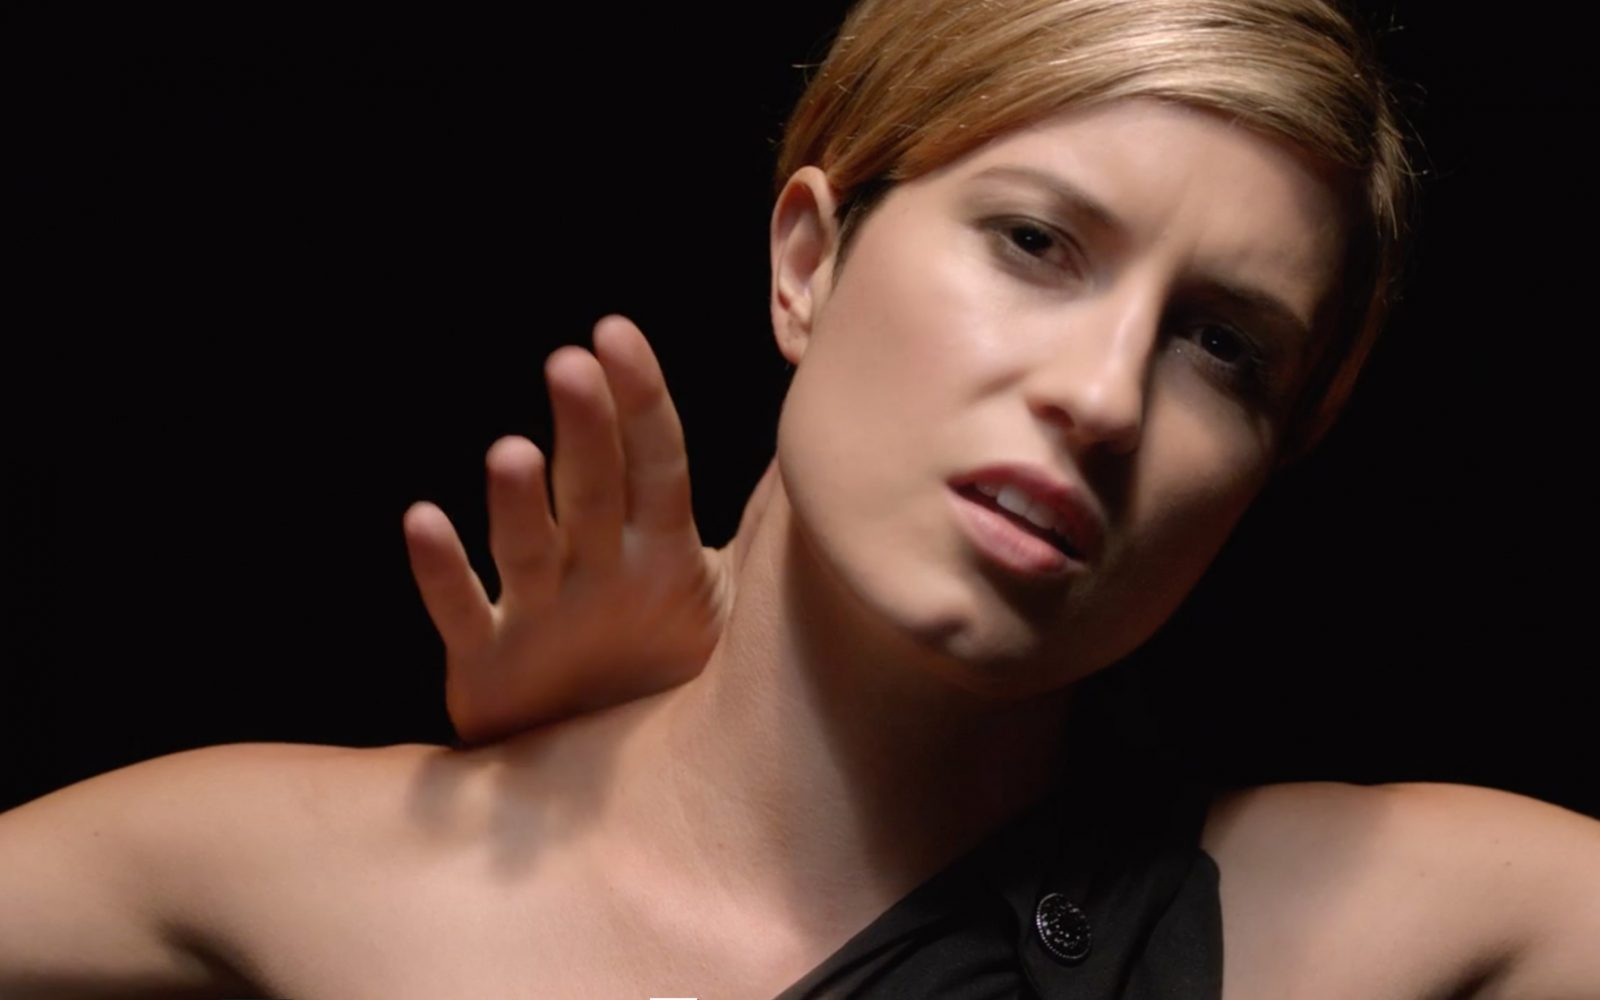 MUSICVID_Missy-Higgins-'Unashamed-Desire'_05